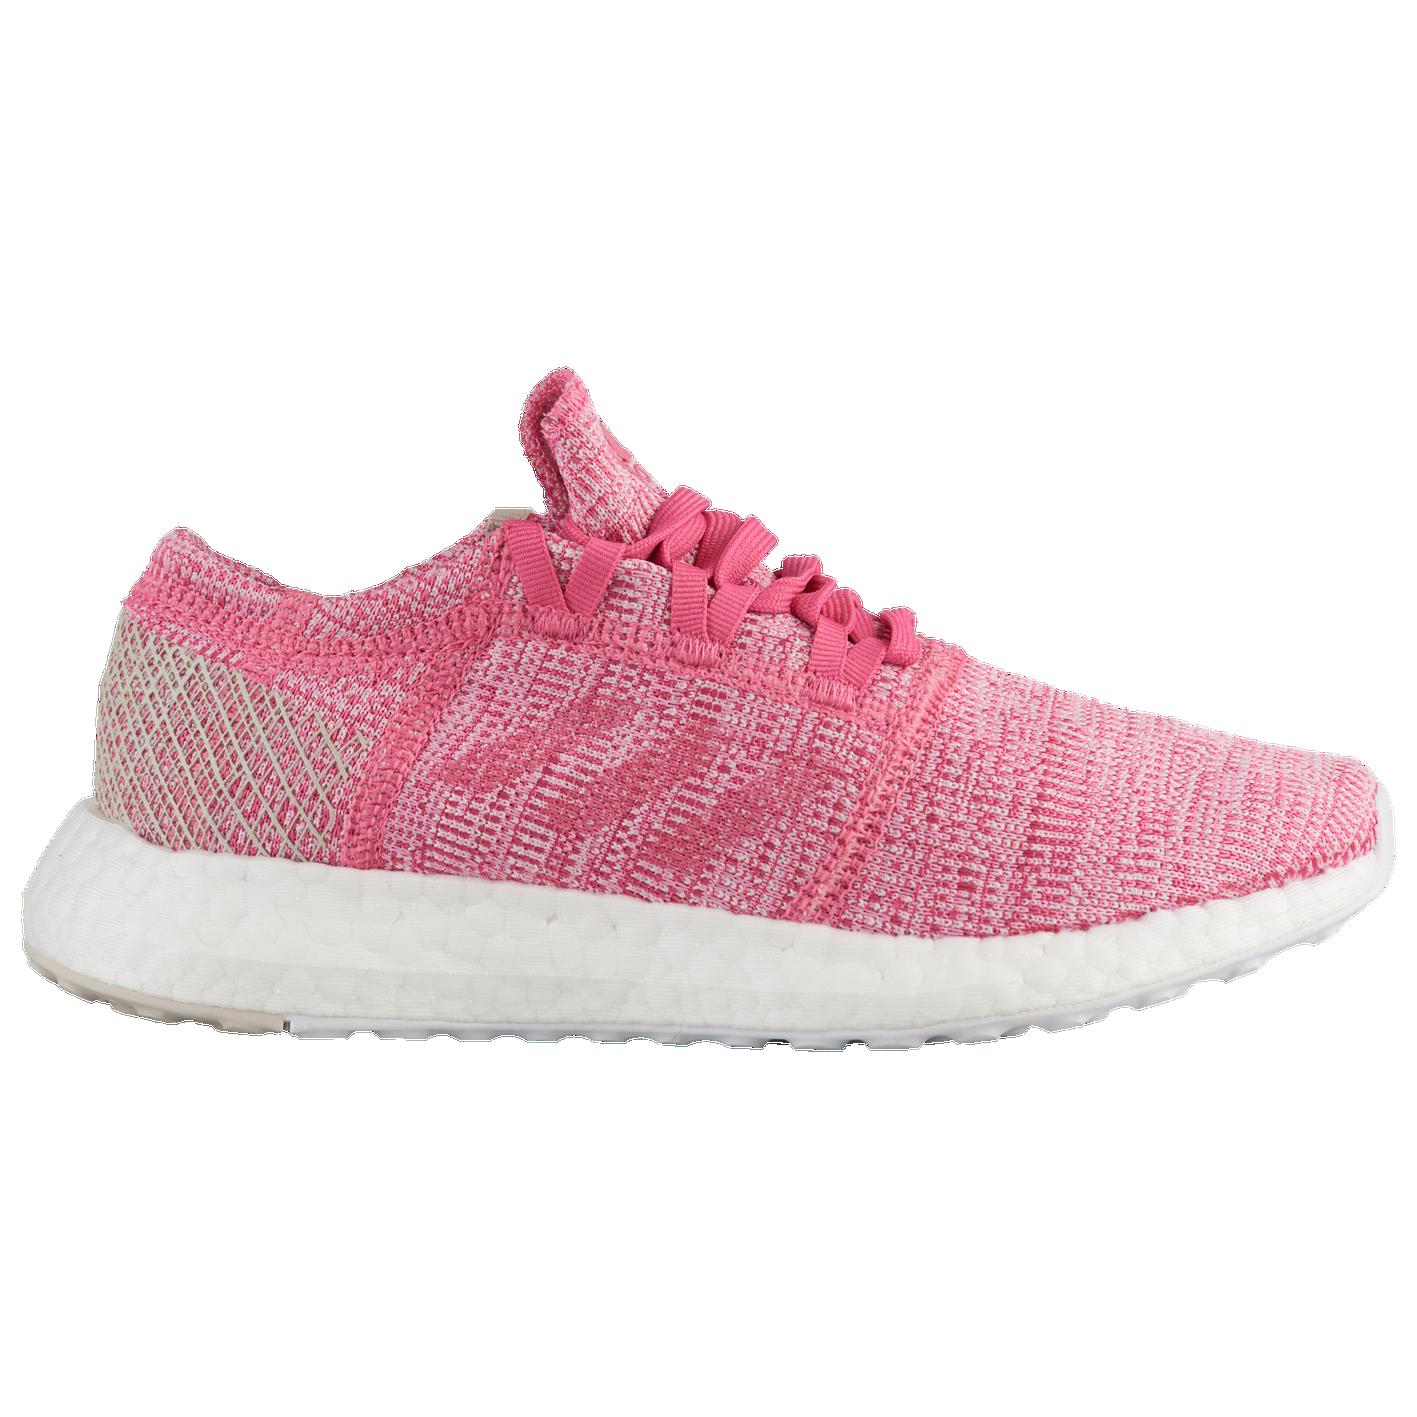 954fab199 adidas PureBOOST GO - Girls' Grade School. $54.99 - $59.99. Product #:  F34010G. Selected Style: Semi Solar Pink/Semi Solar Pink/Clear Brown